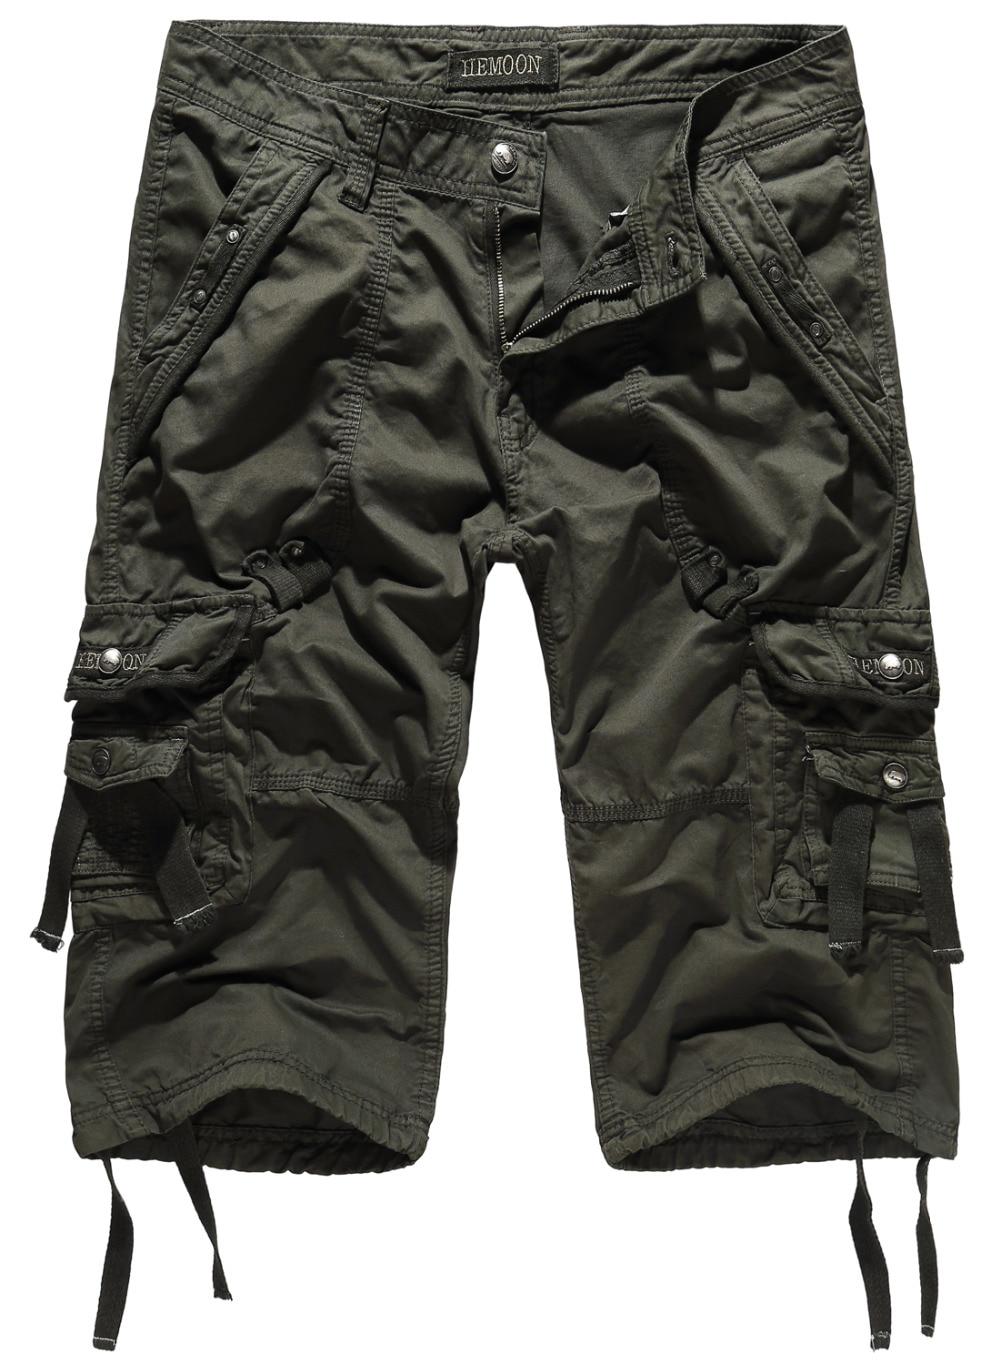 Online Get Cheap Mens Shorts 3 4 -Aliexpress.com | Alibaba Group